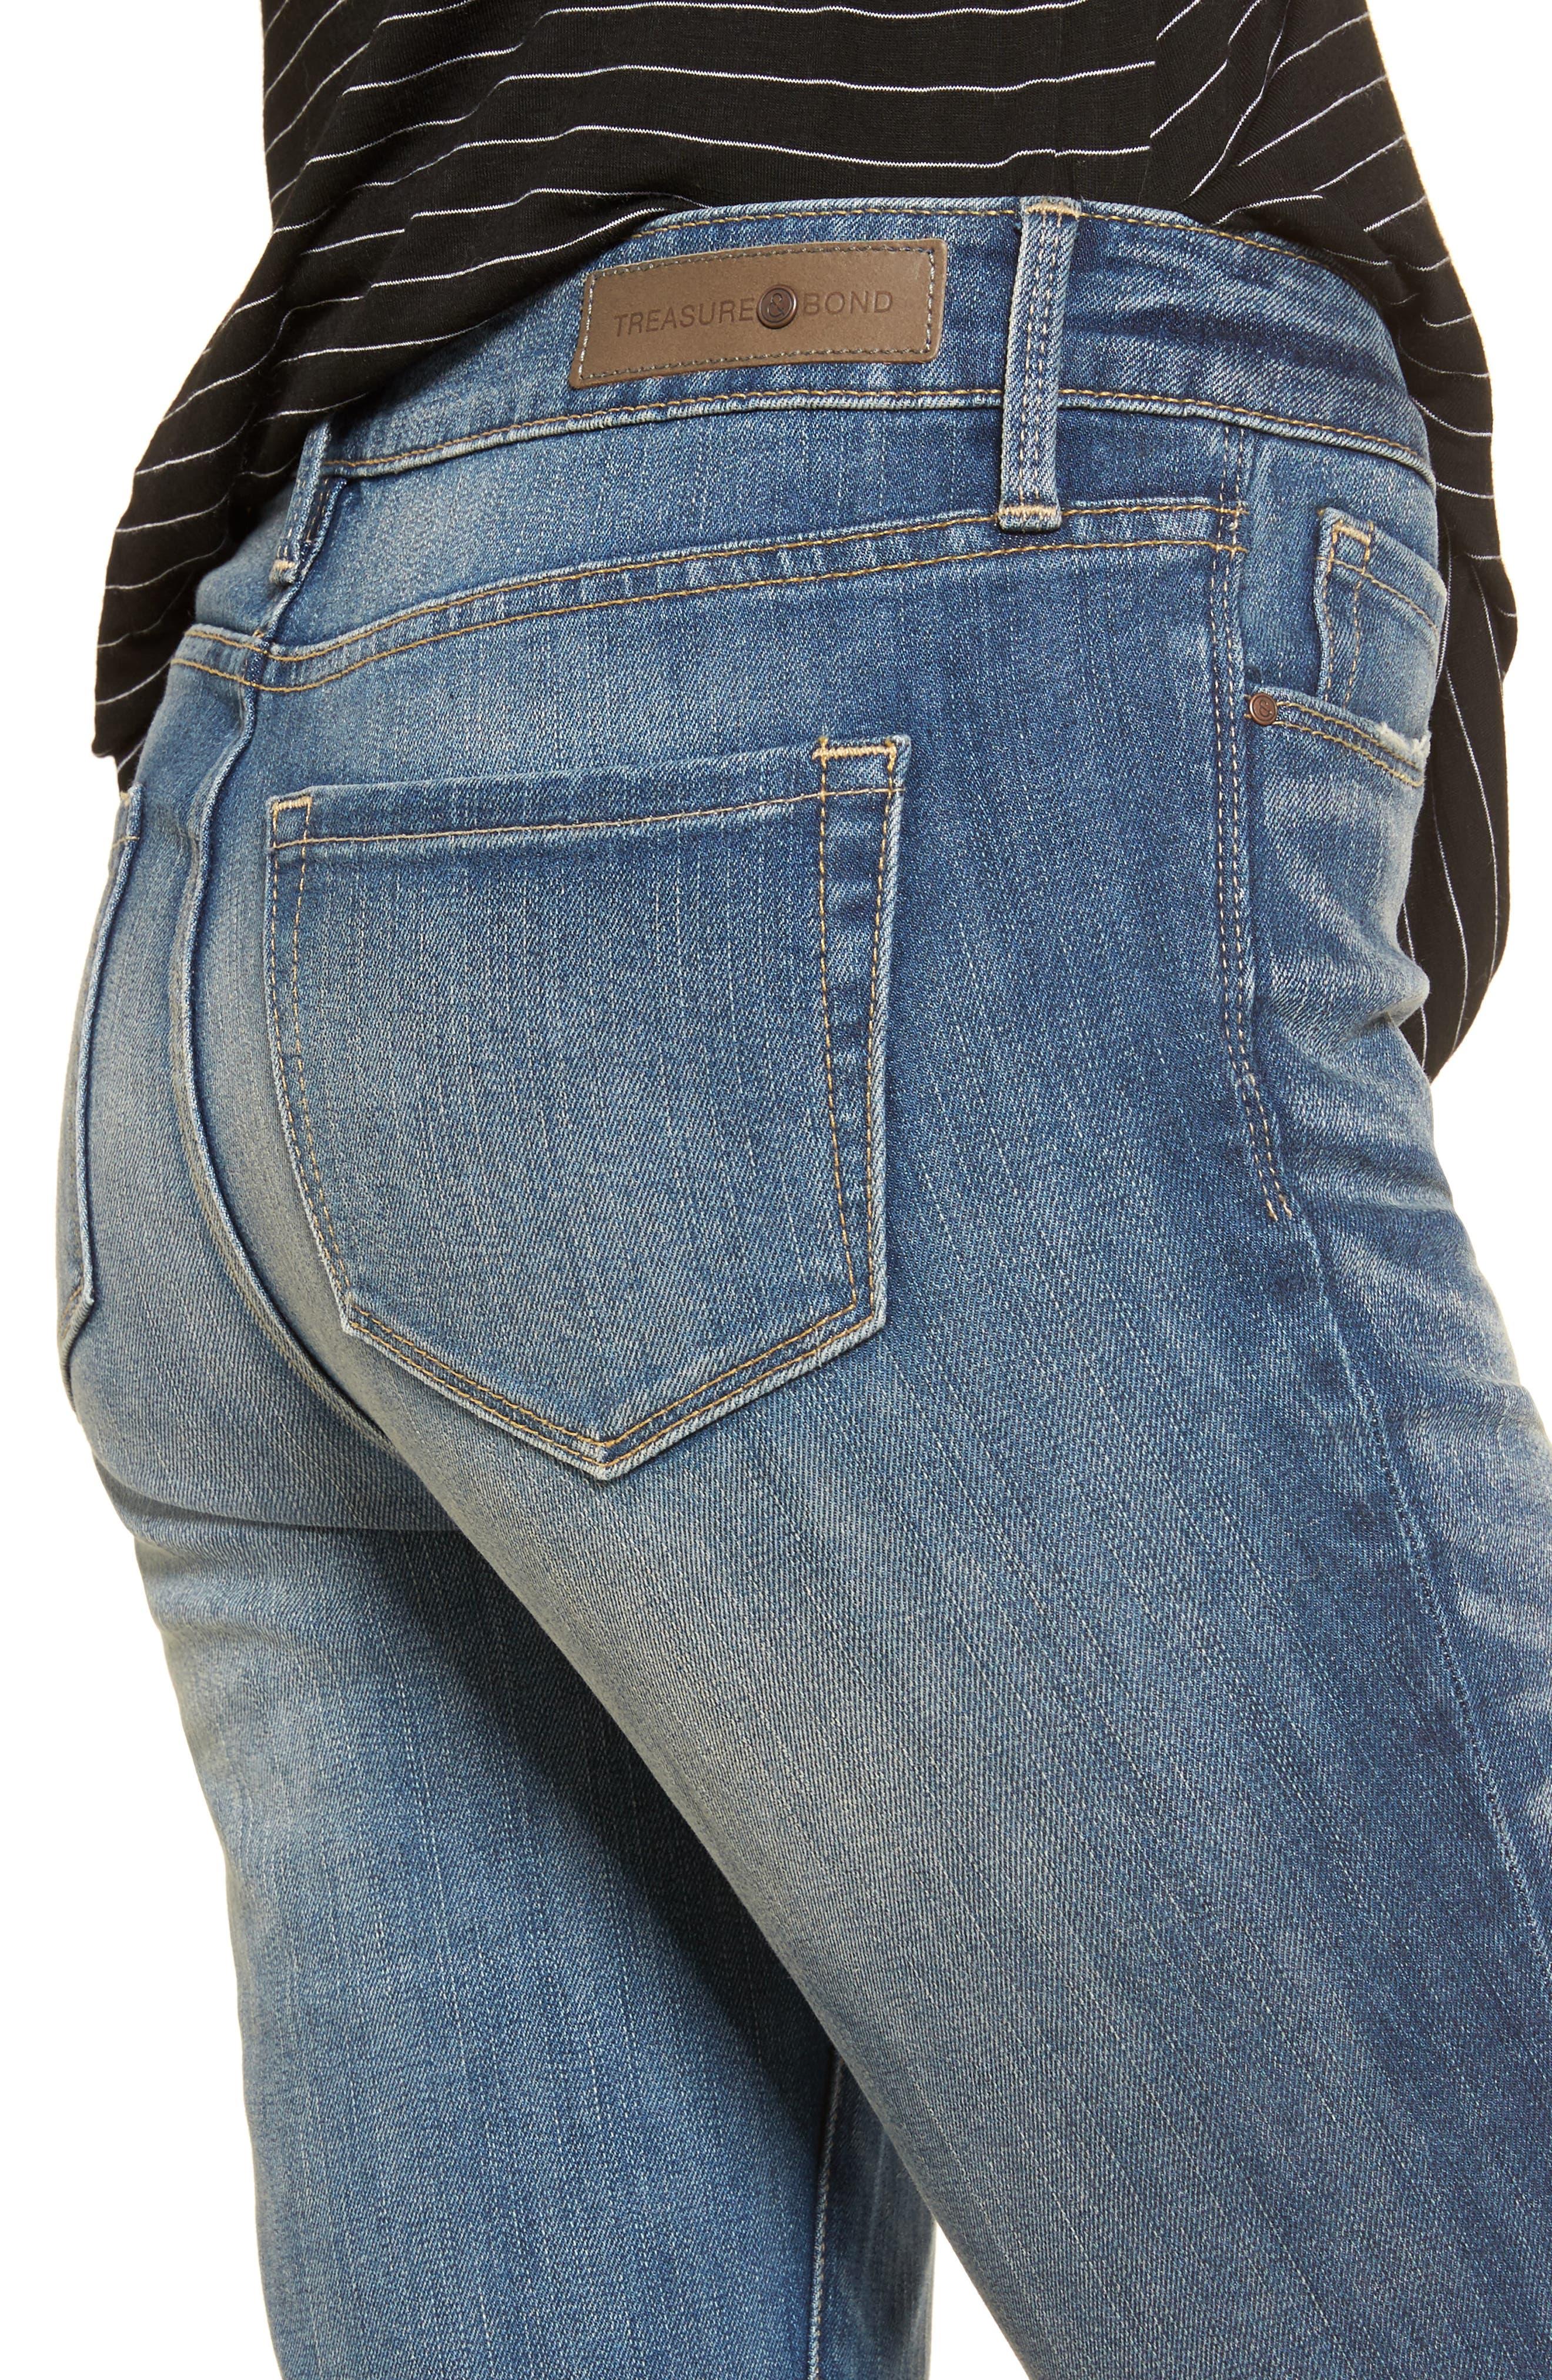 High Waist Skinny Jeans,                             Alternate thumbnail 6, color,                             Rain Medium Worn